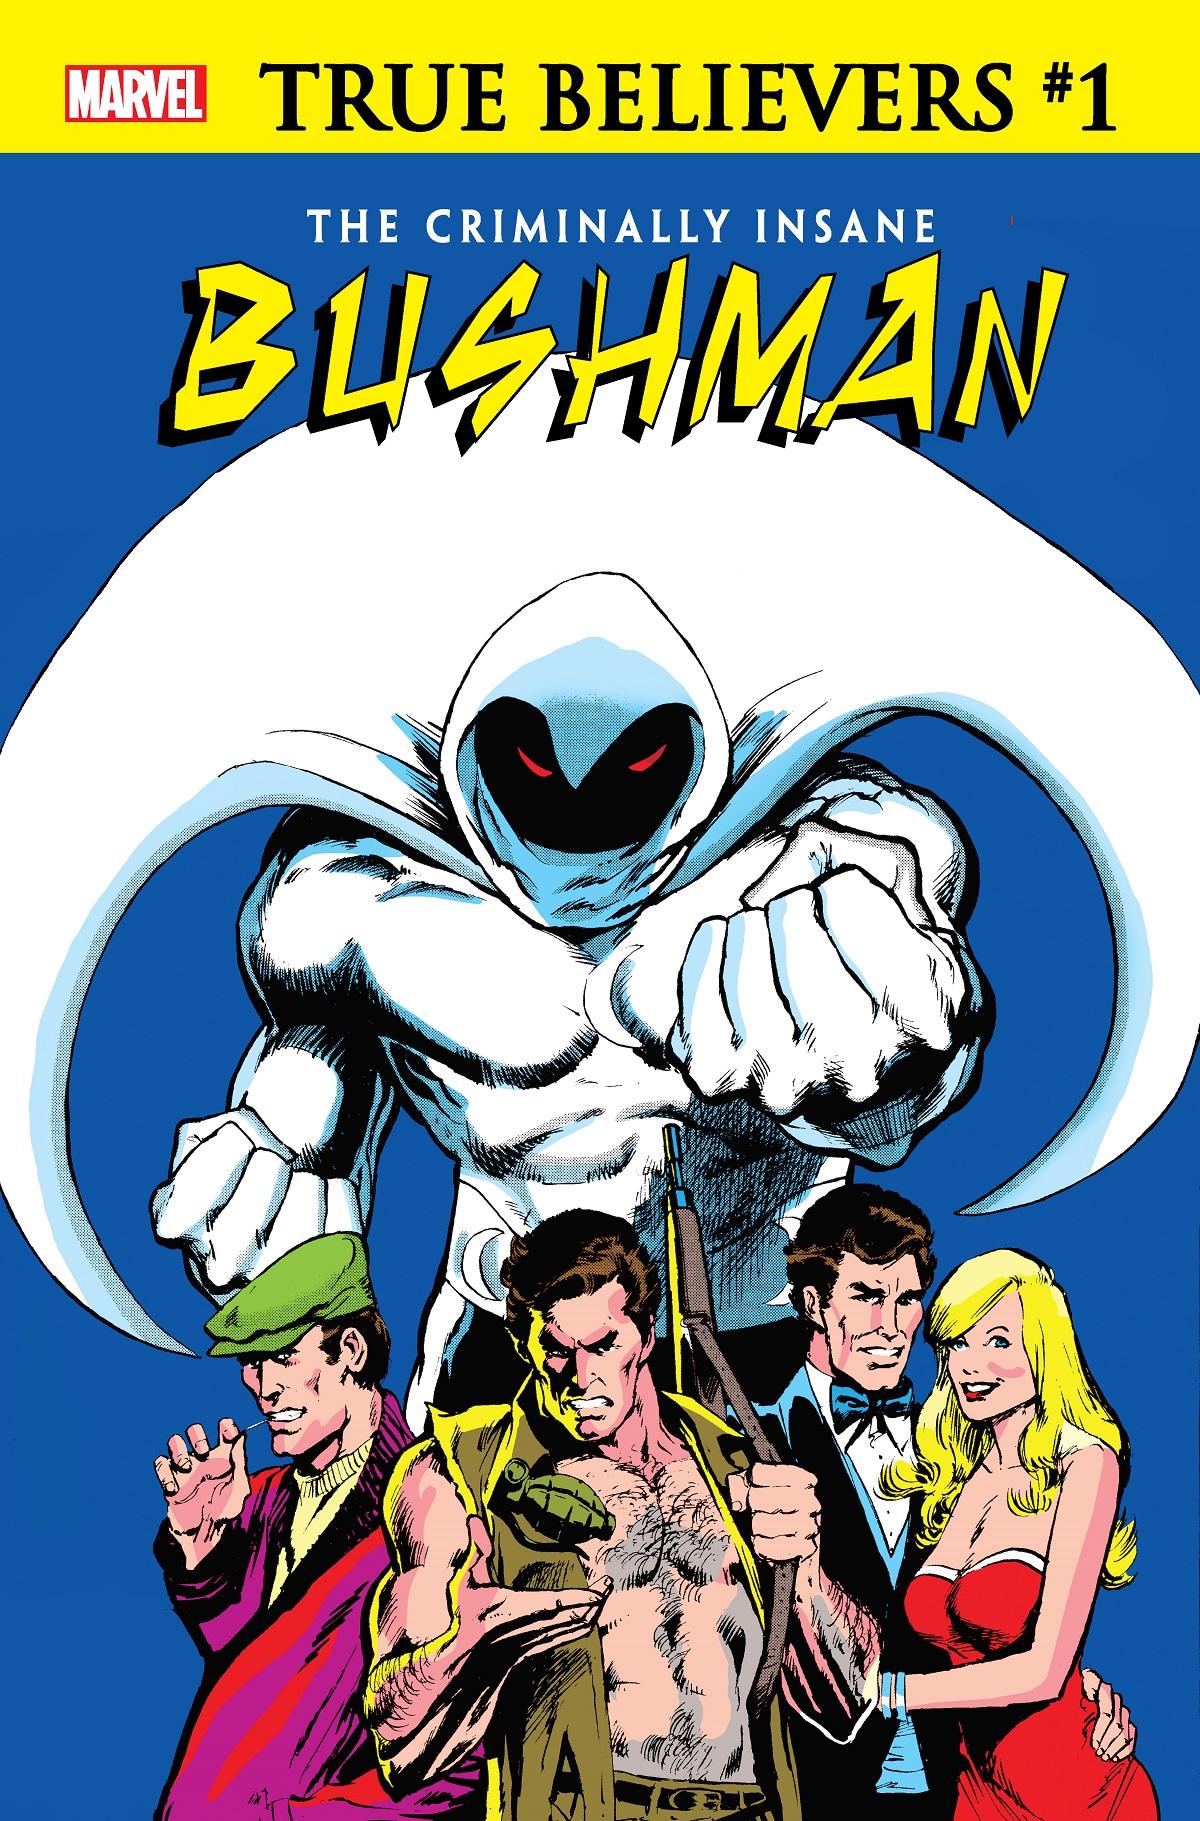 True Believers: The Criminally Insane - Bushman (2020) #1